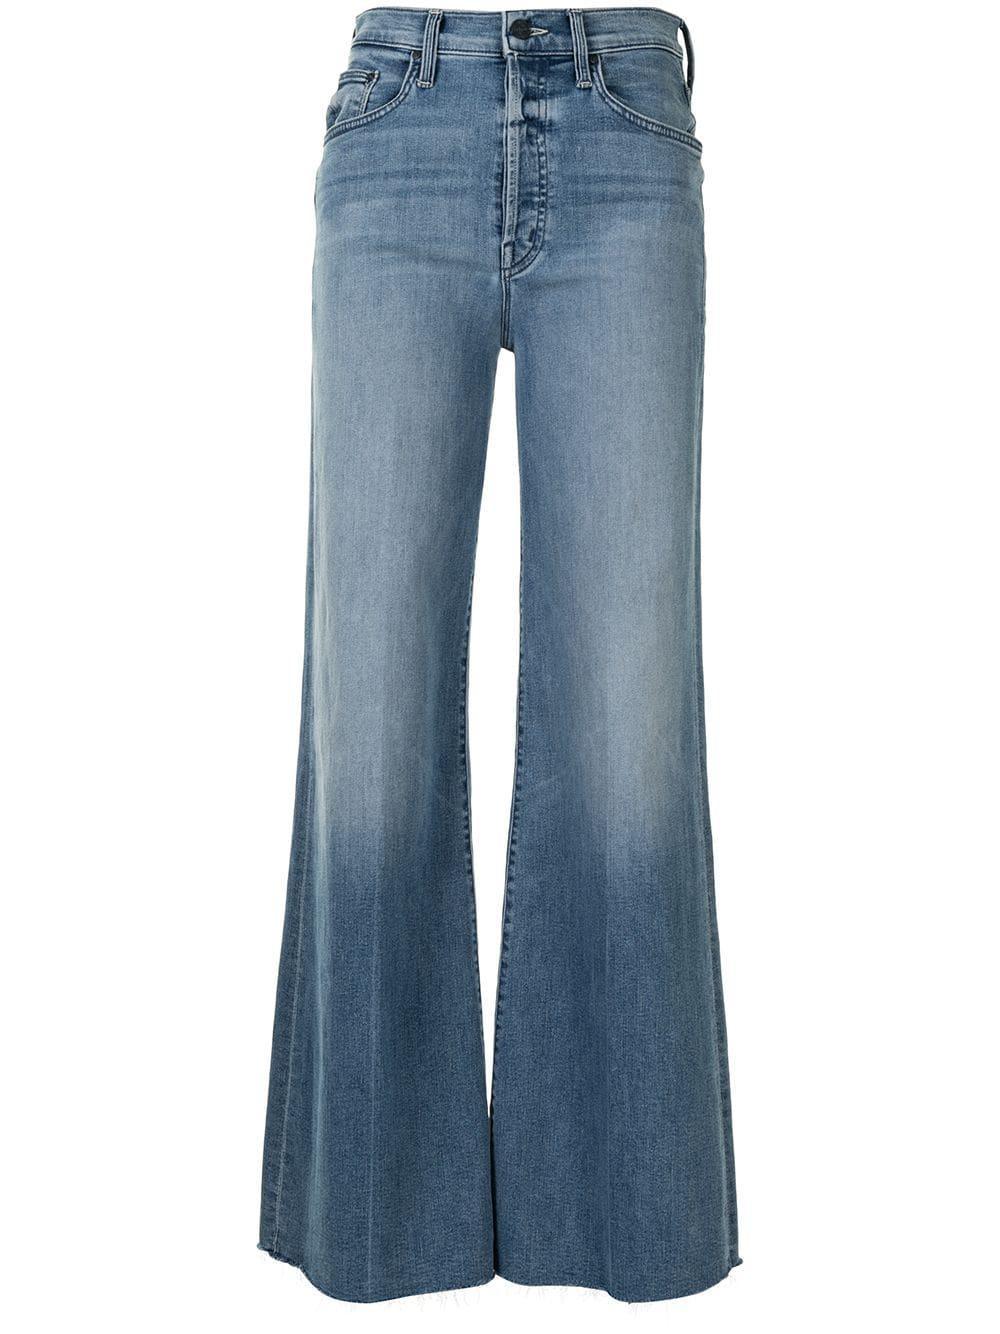 The Tomcat Wide Leg Jean Item # 1225-104